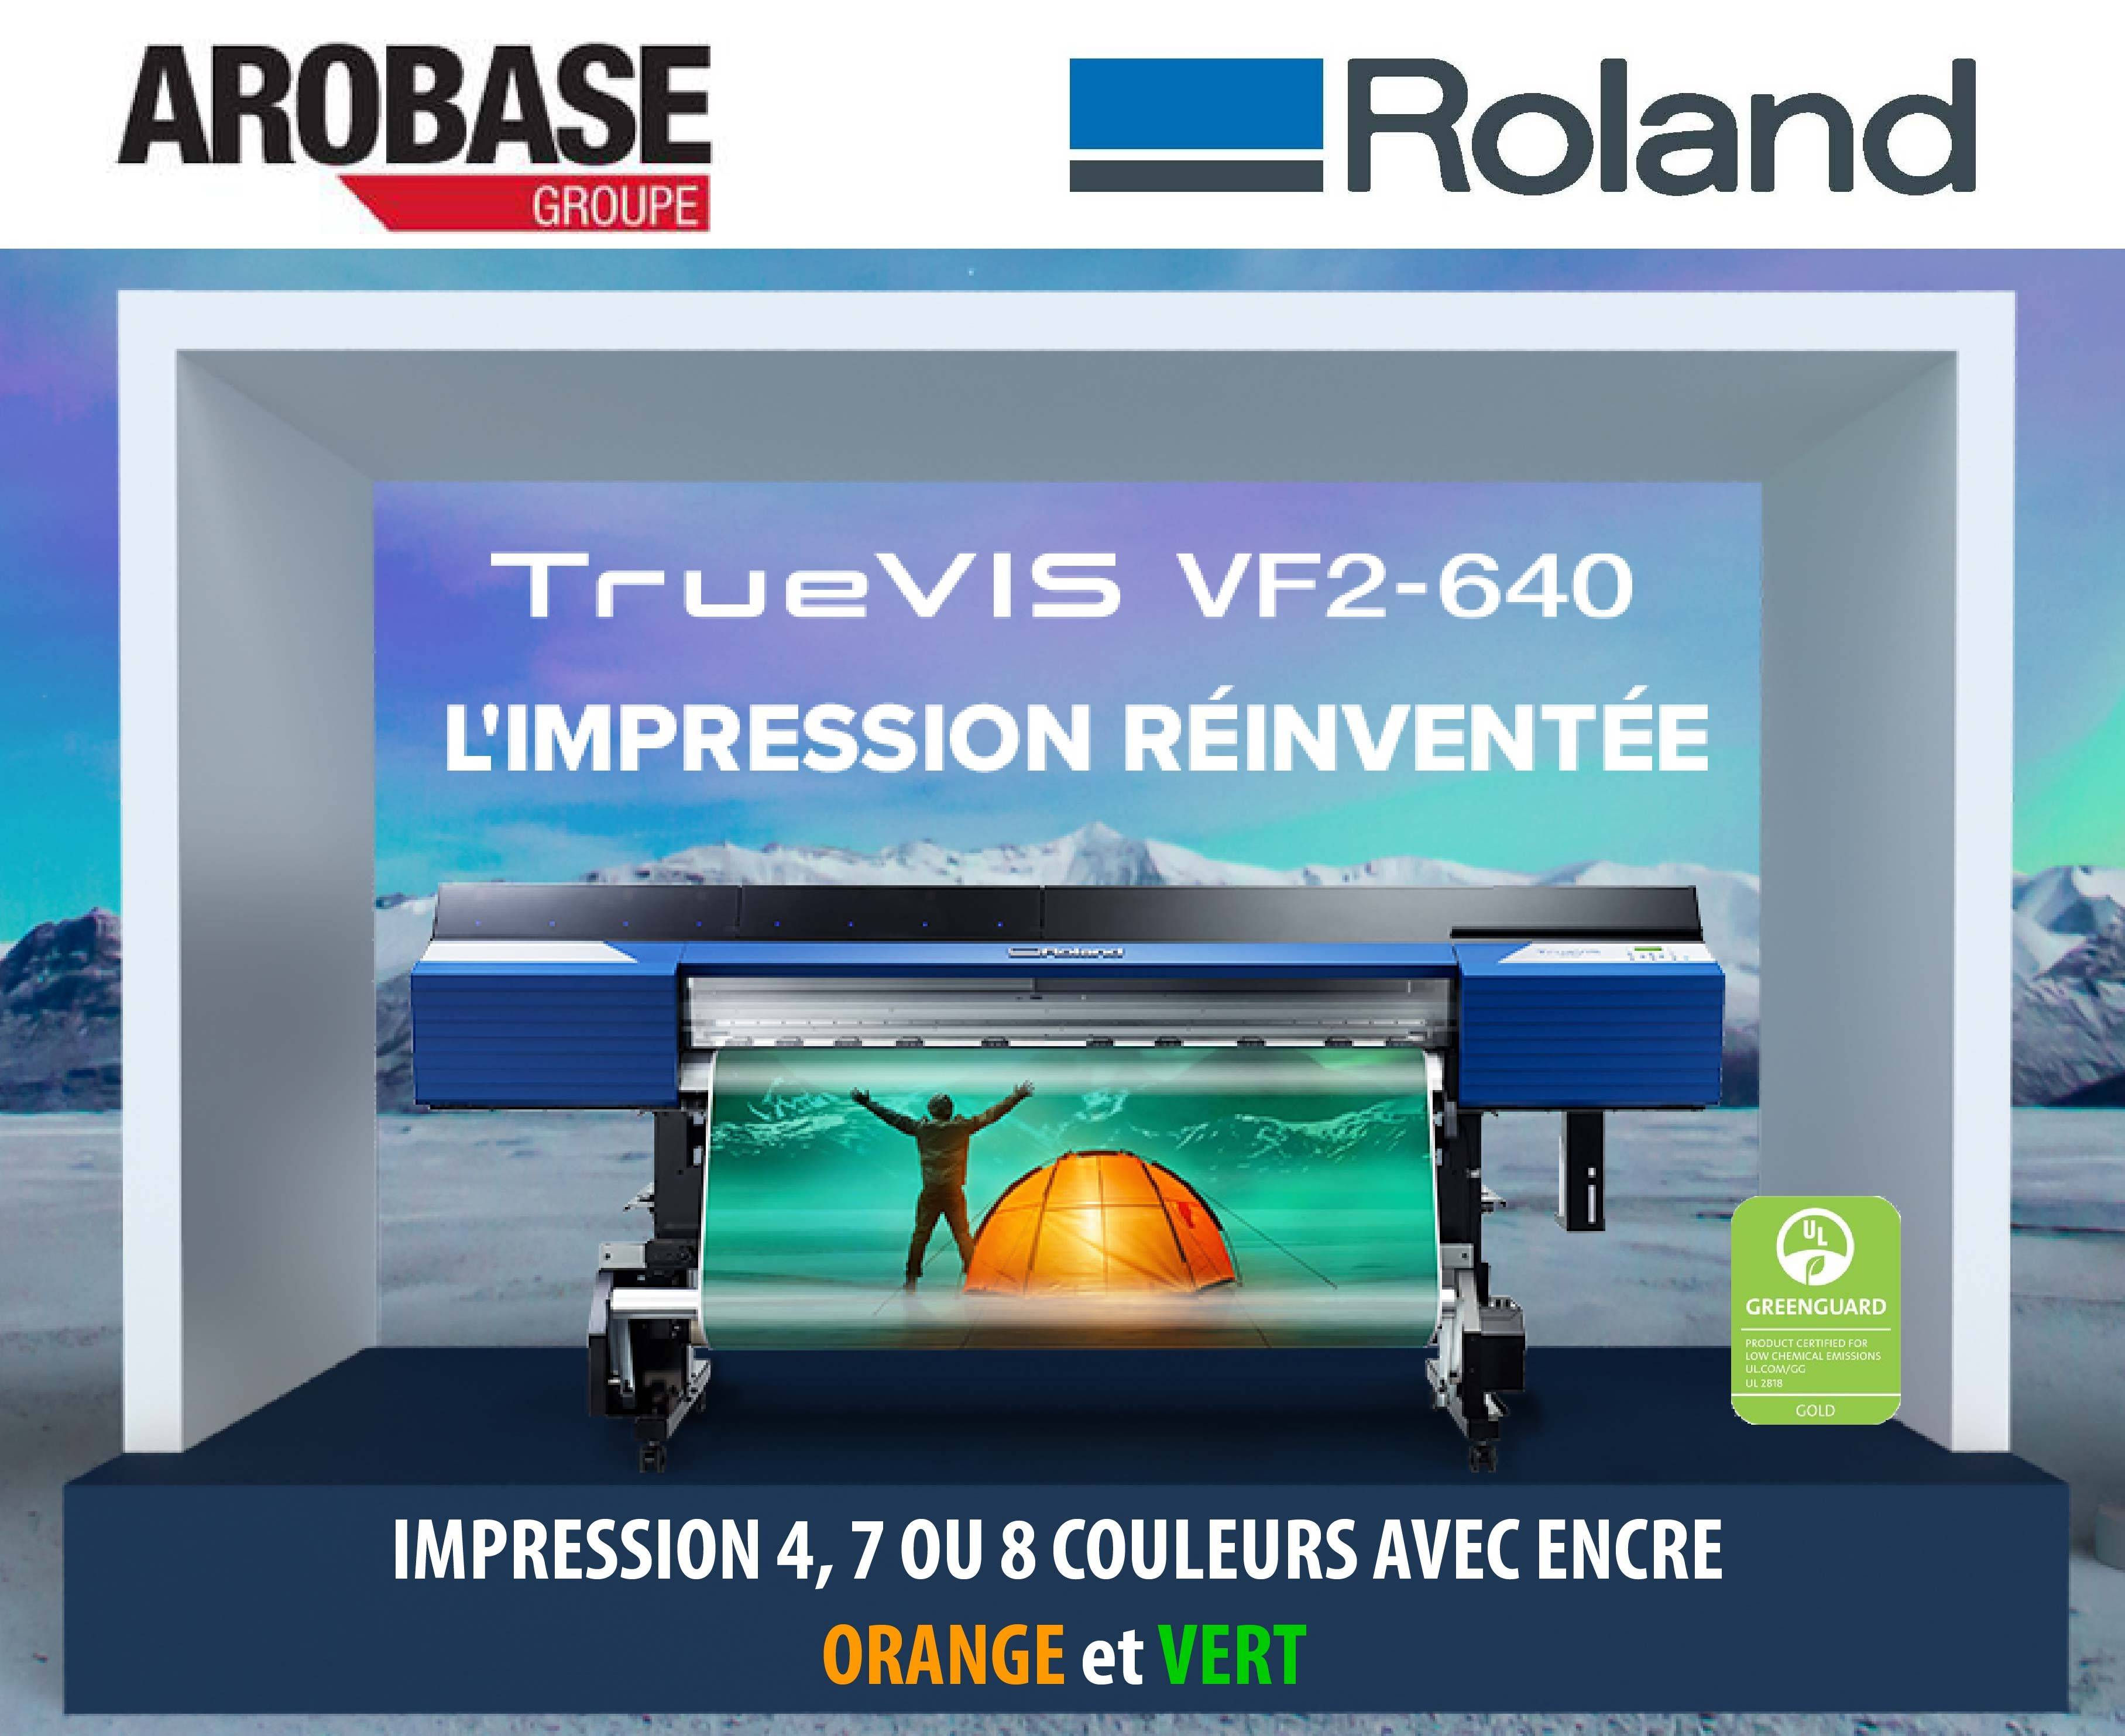 Imprimante Roland True VIS VF2-640